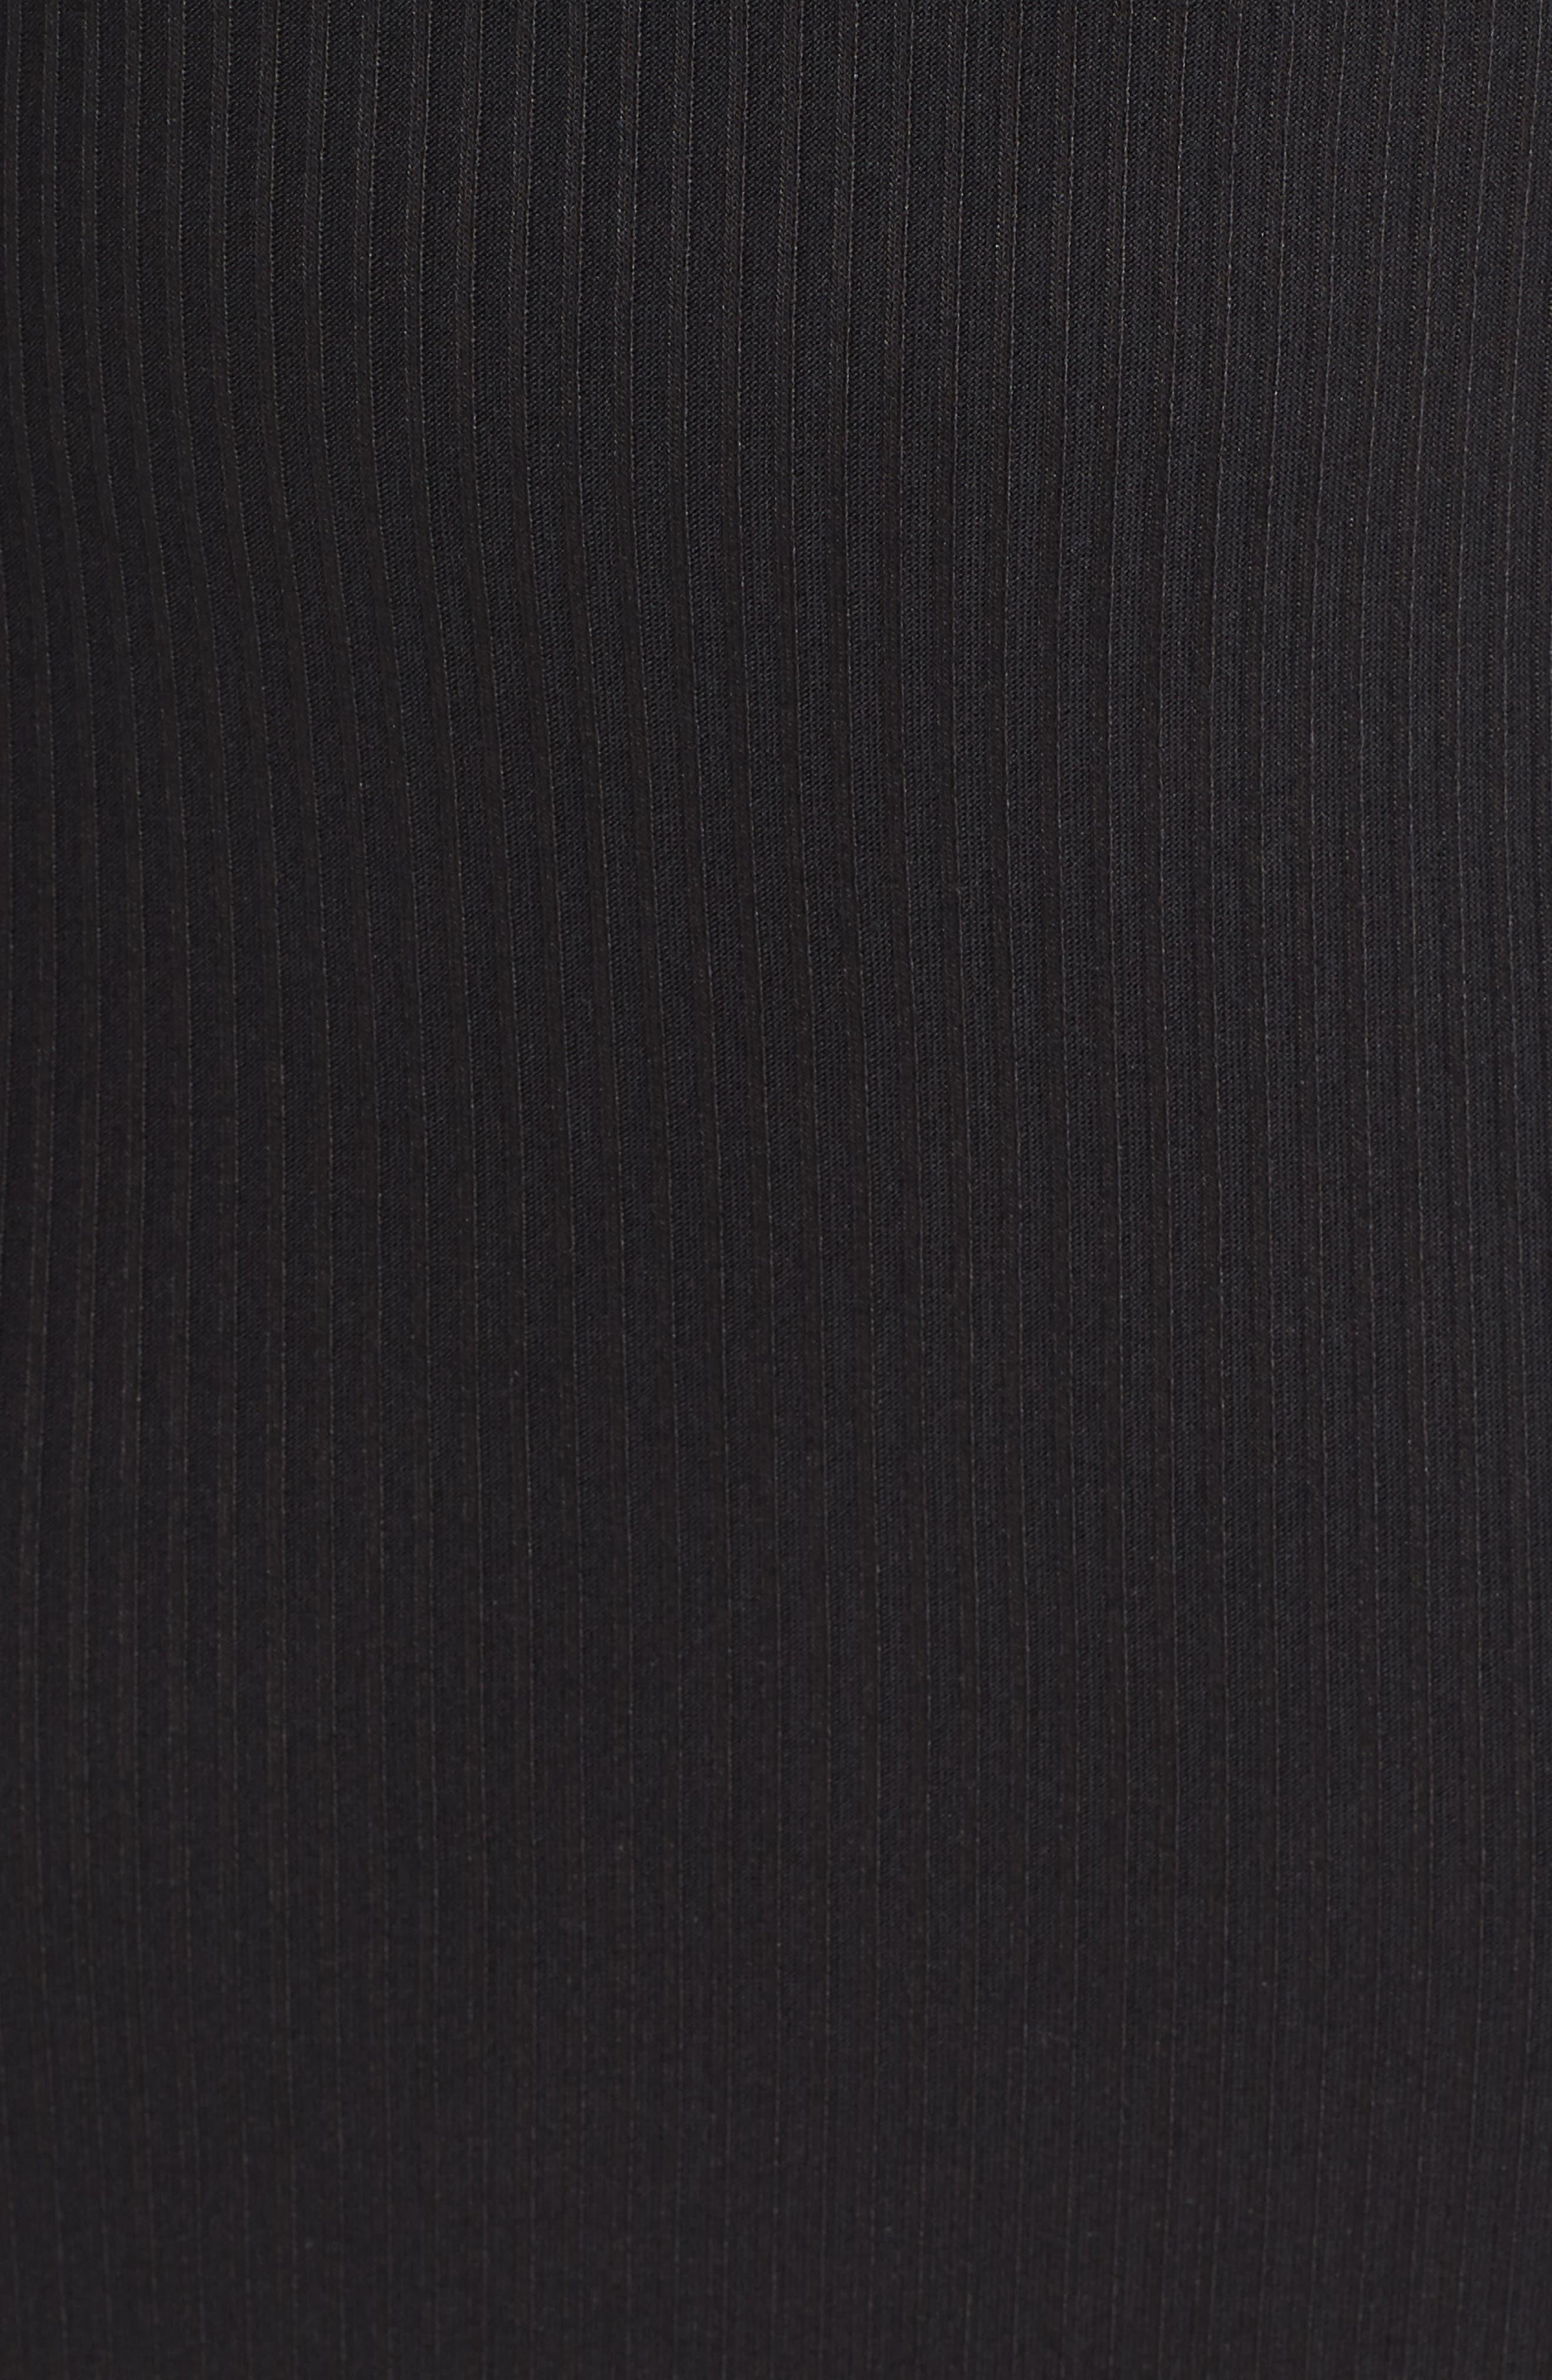 MICHAEL MICHAEL KORS, Chain Lace-Up V-Neck Sweater Dress, Alternate thumbnail 6, color, 001